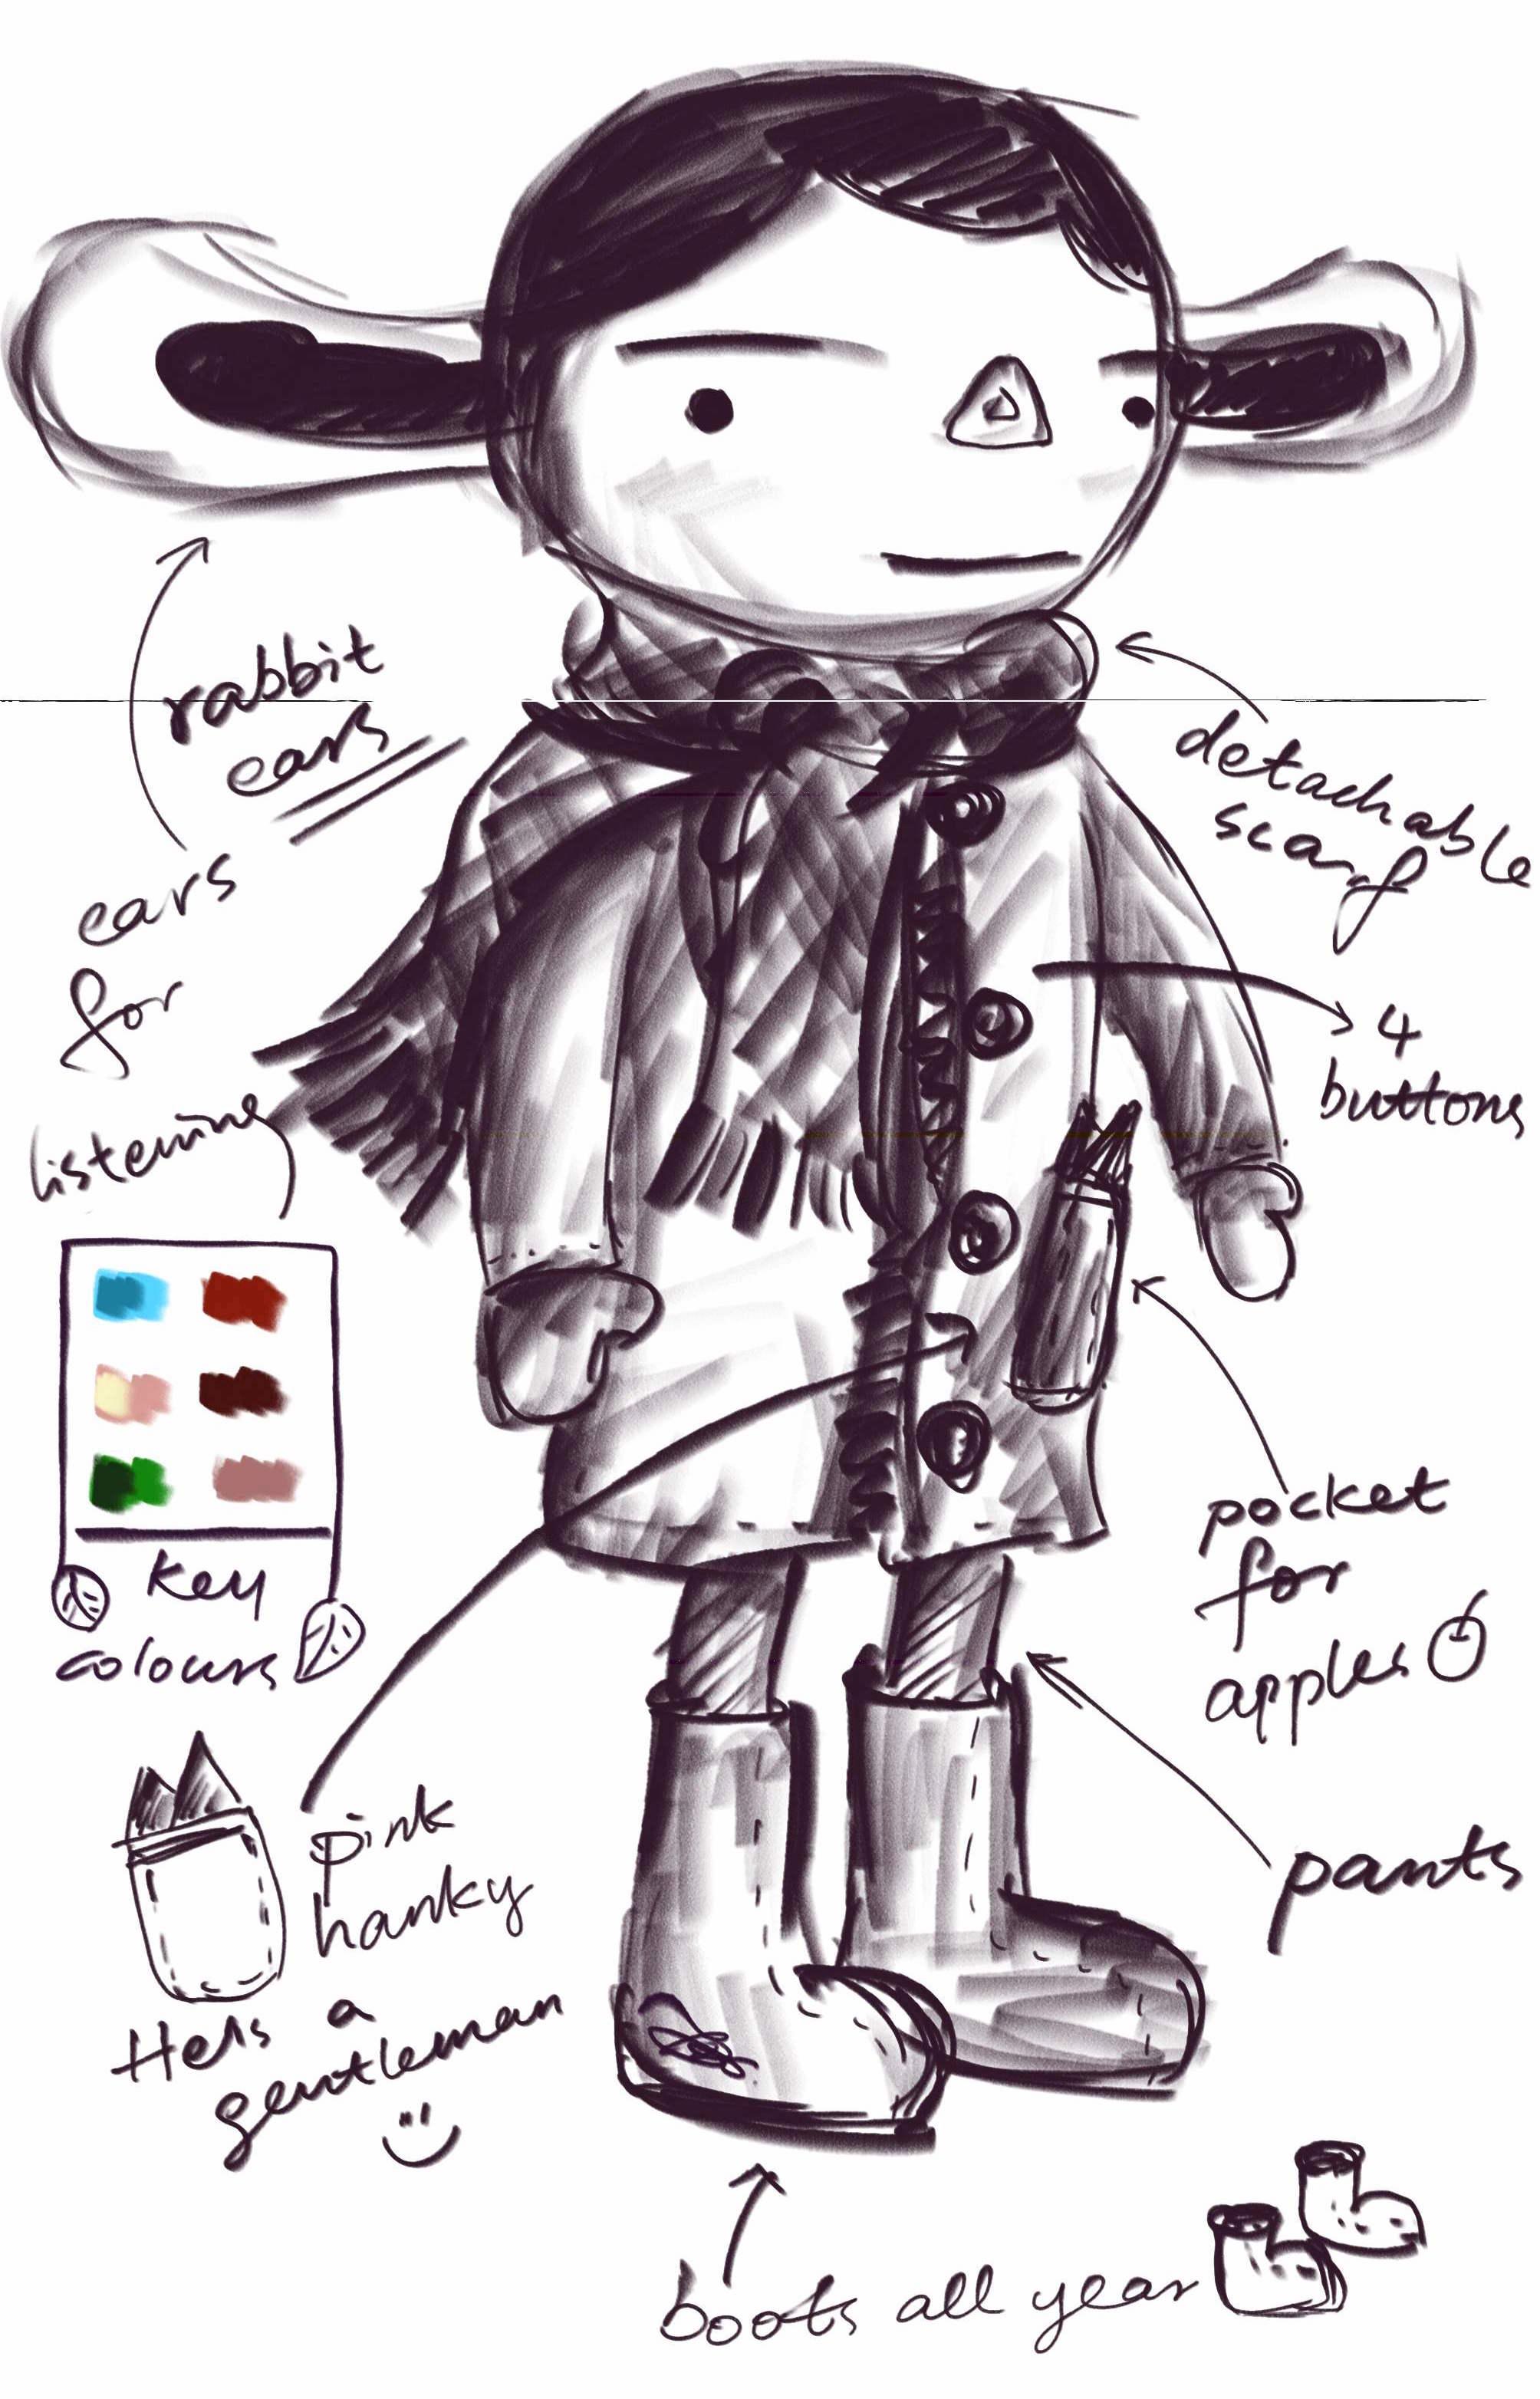 ProductDesign_Toy_ConceptSketch_Henri